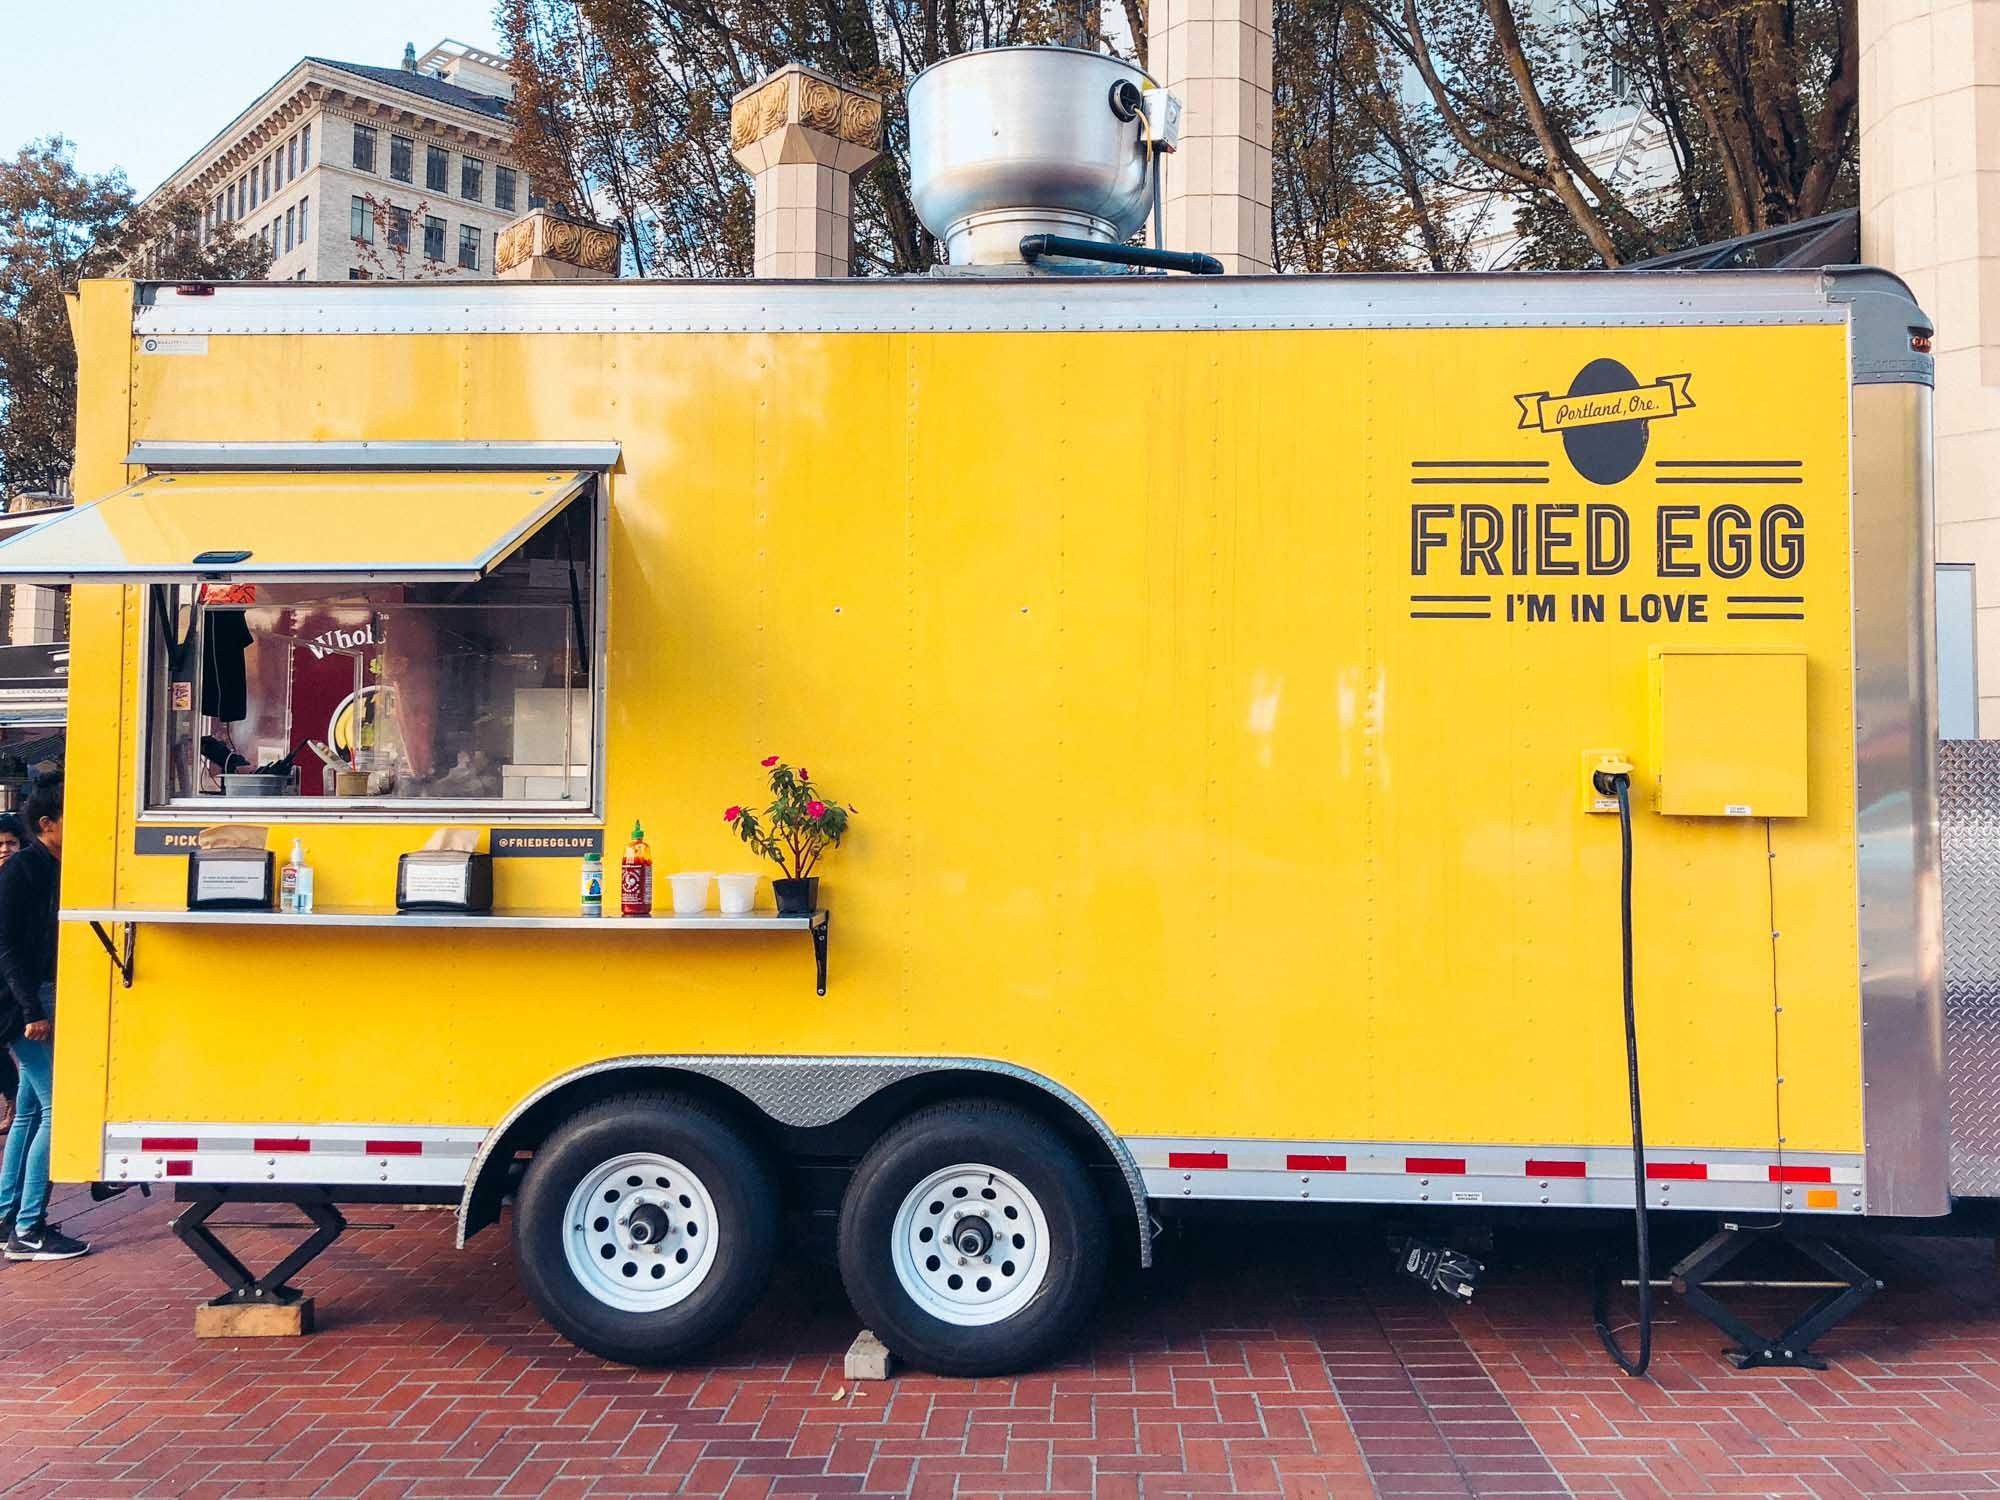 Best vegetarian restaurants in Portland - Fried Egg I'm in Love